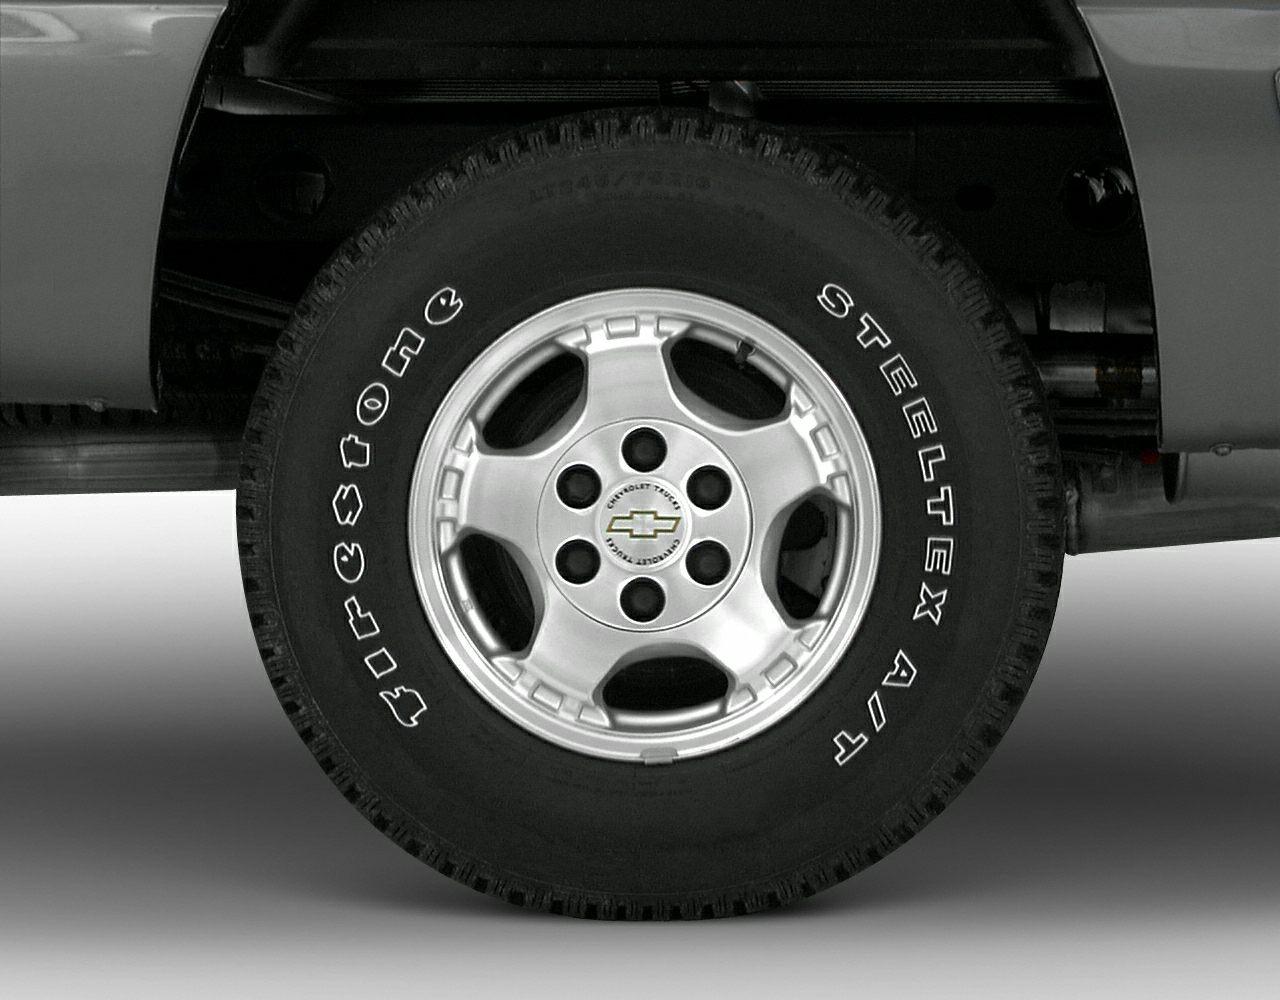 2000 Chevrolet Silverado 1500 Exterior Photo